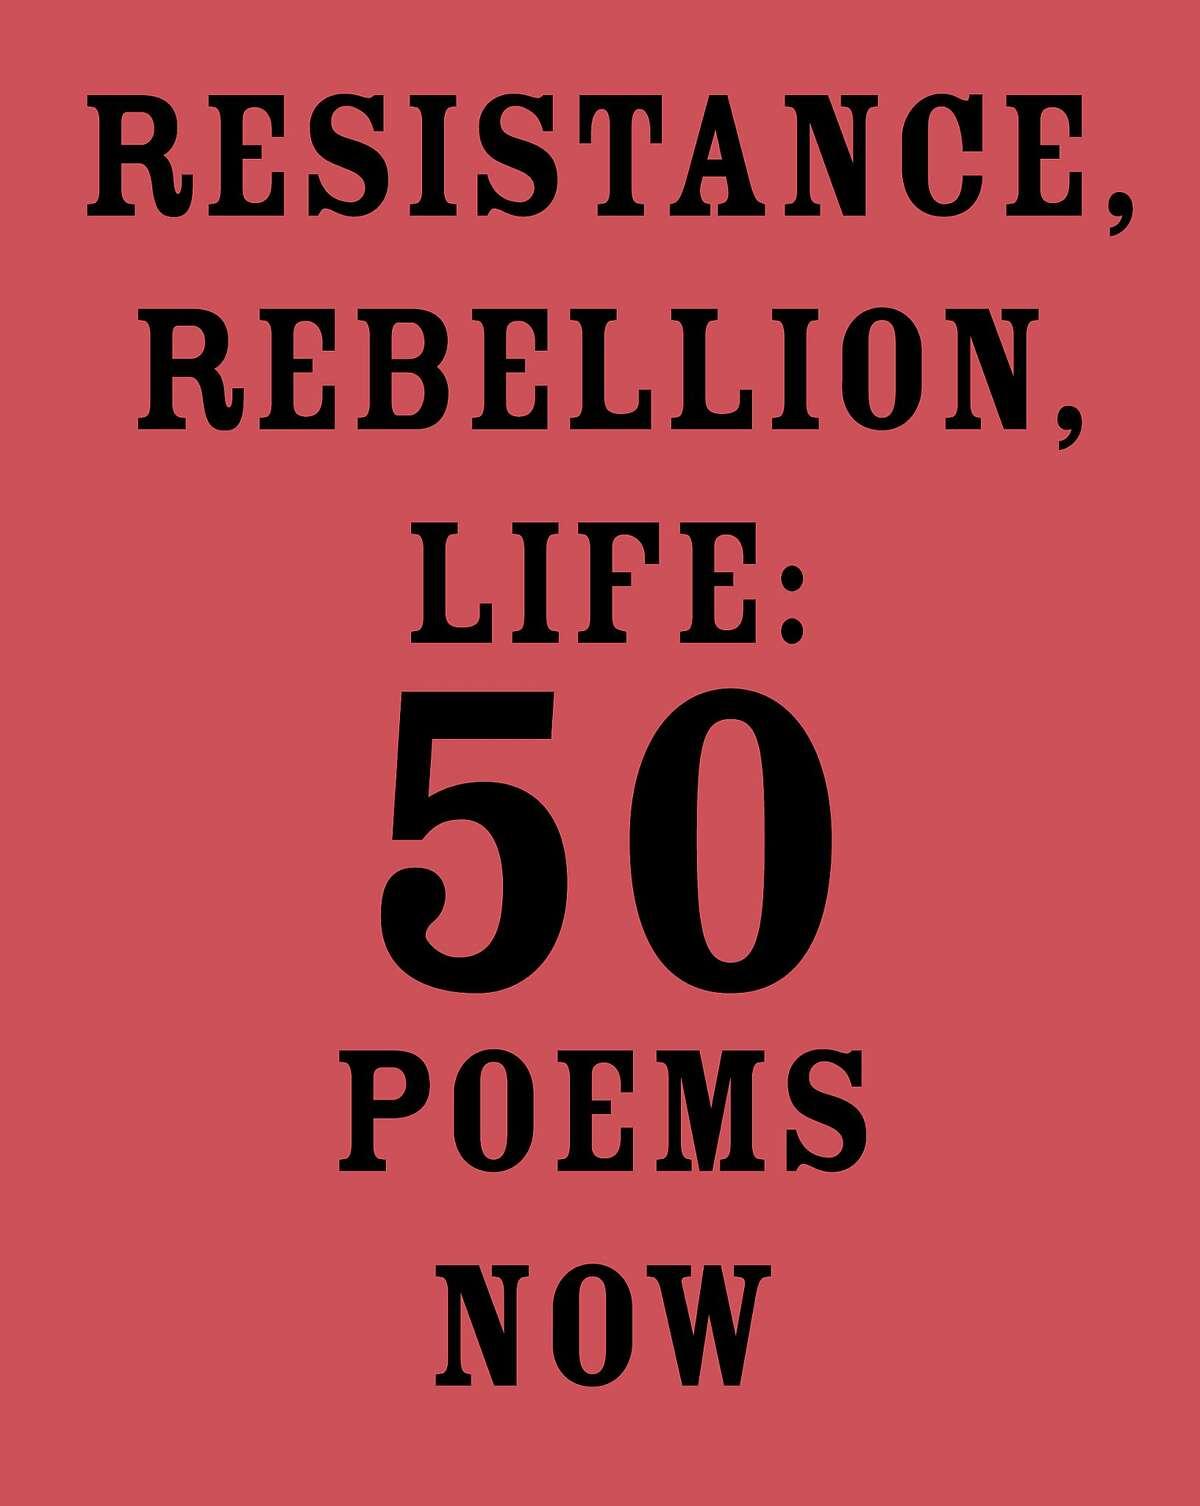 """Resistance, Rebellion, Life"""